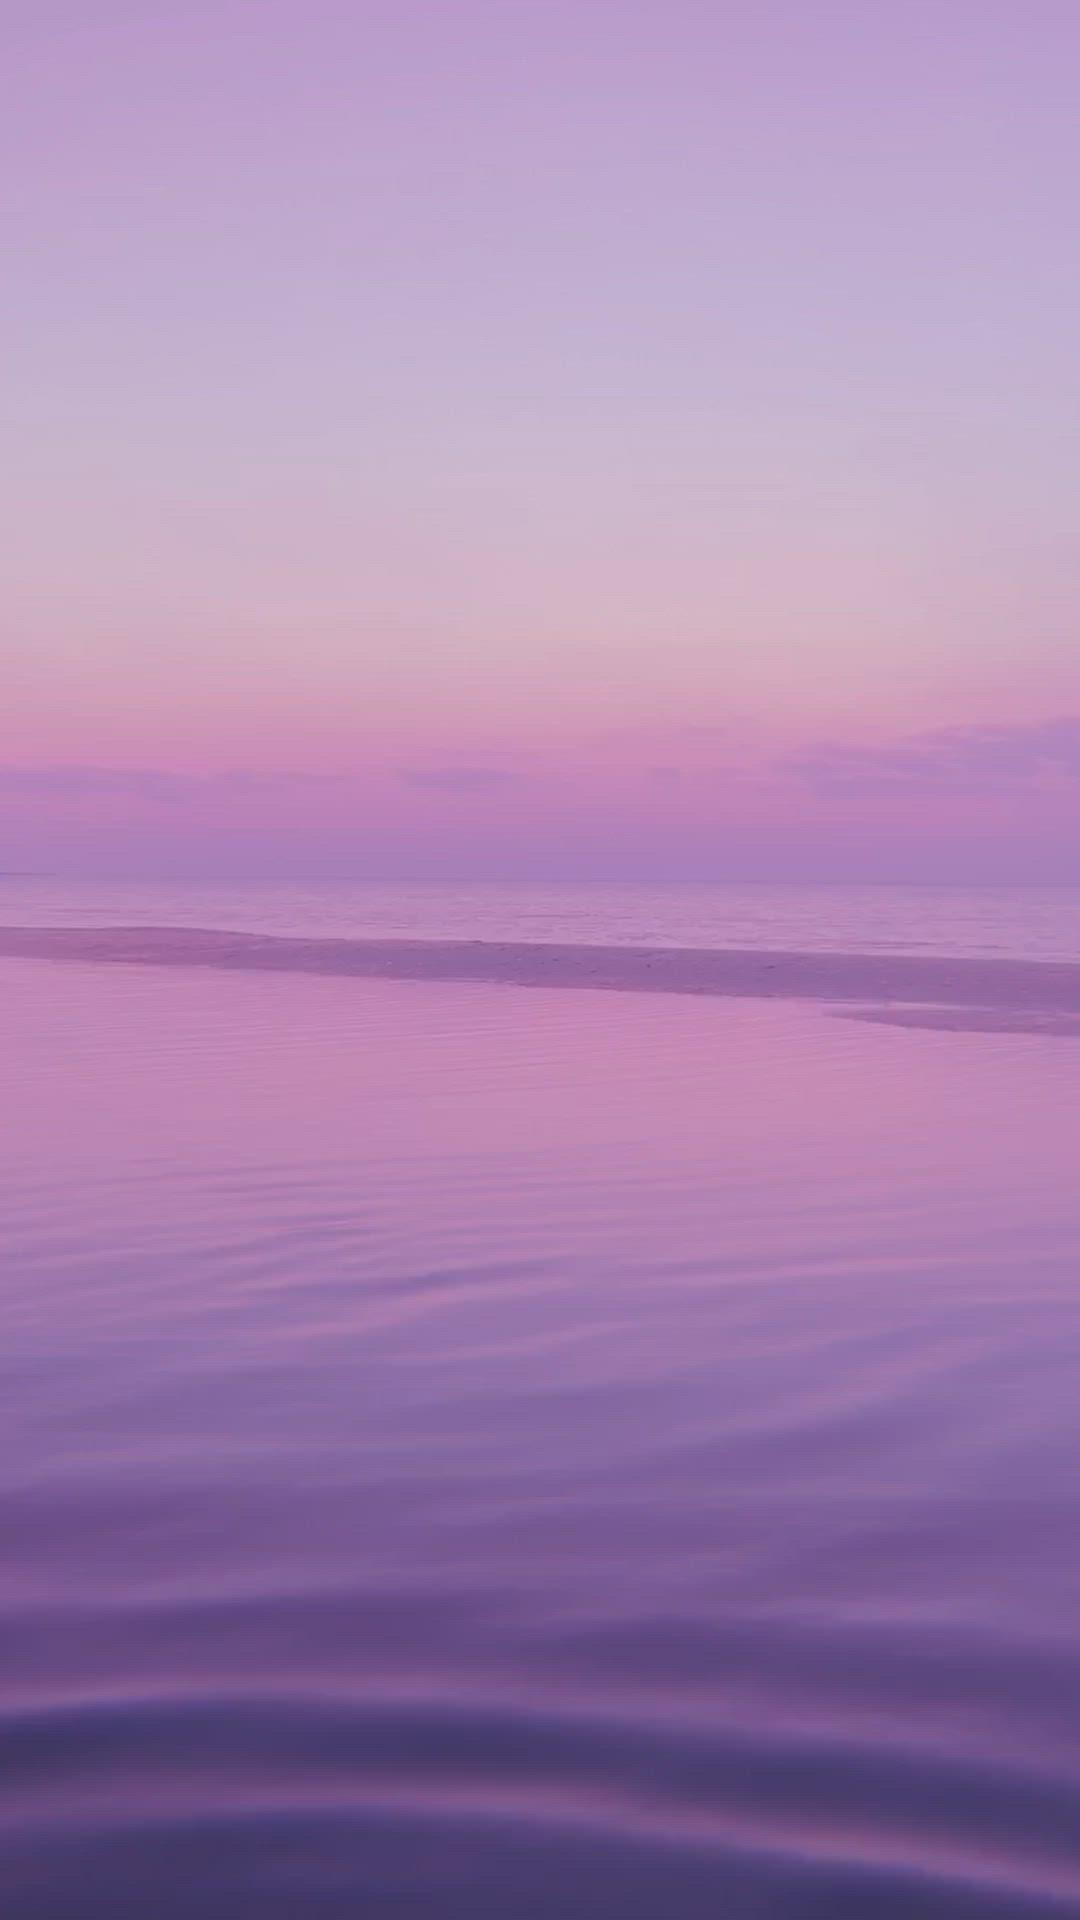 Pink Sunset Aesthetic Video Sunrise Photography Sunset Photography Conceptual Art